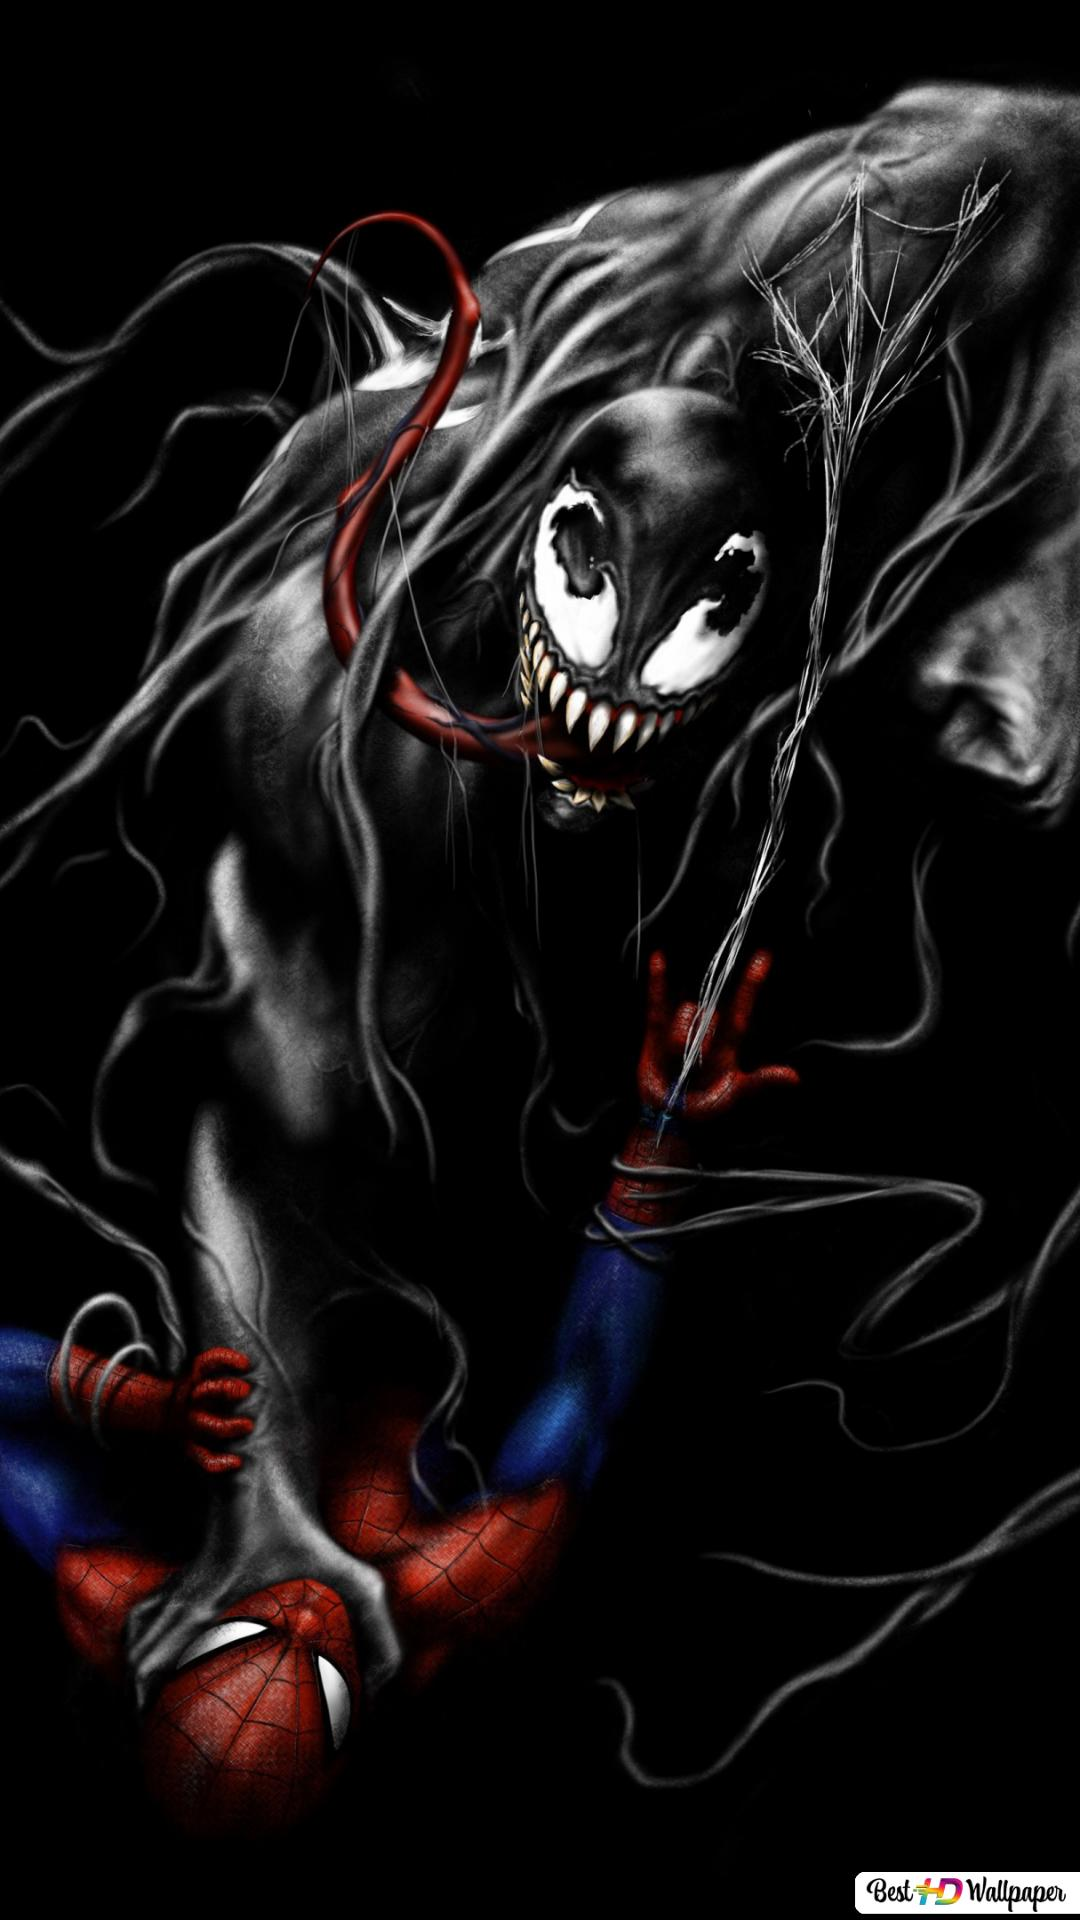 Venom Take Over Spider Man Hd Wallpaper Download